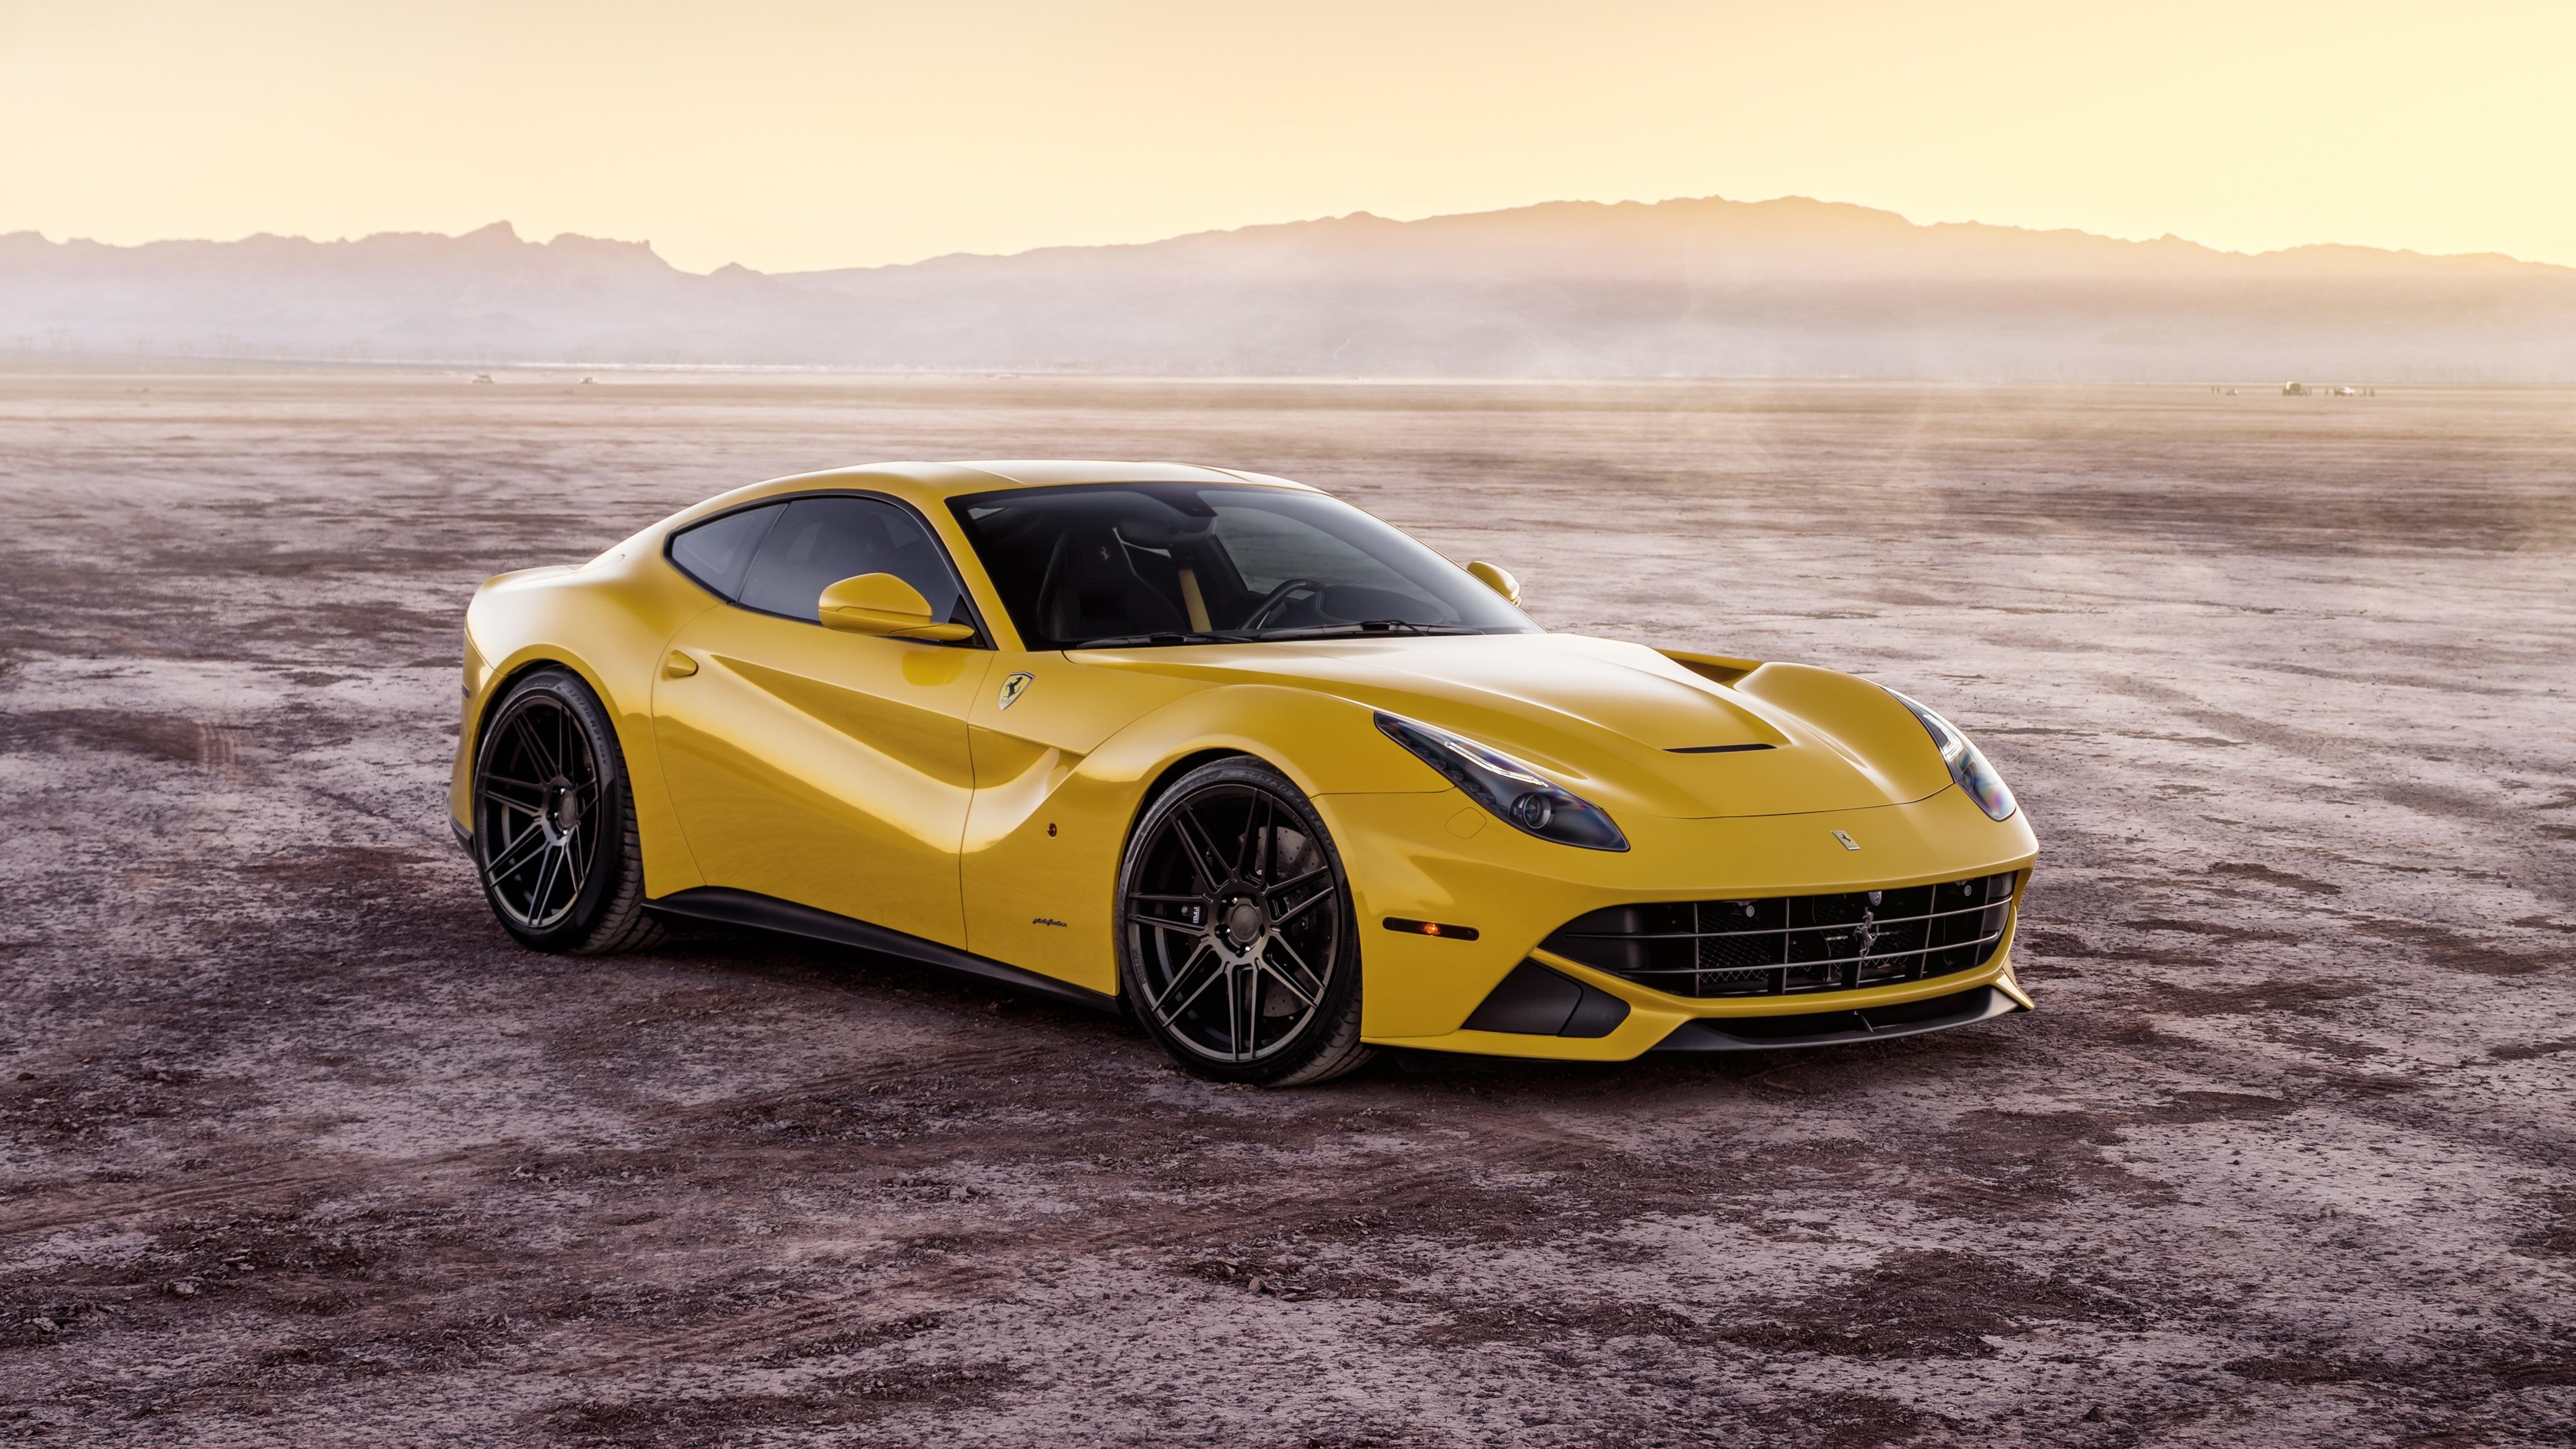 Ferrada Sema Yellow Ferrari F12 5K 3 Wallpaper HD Car